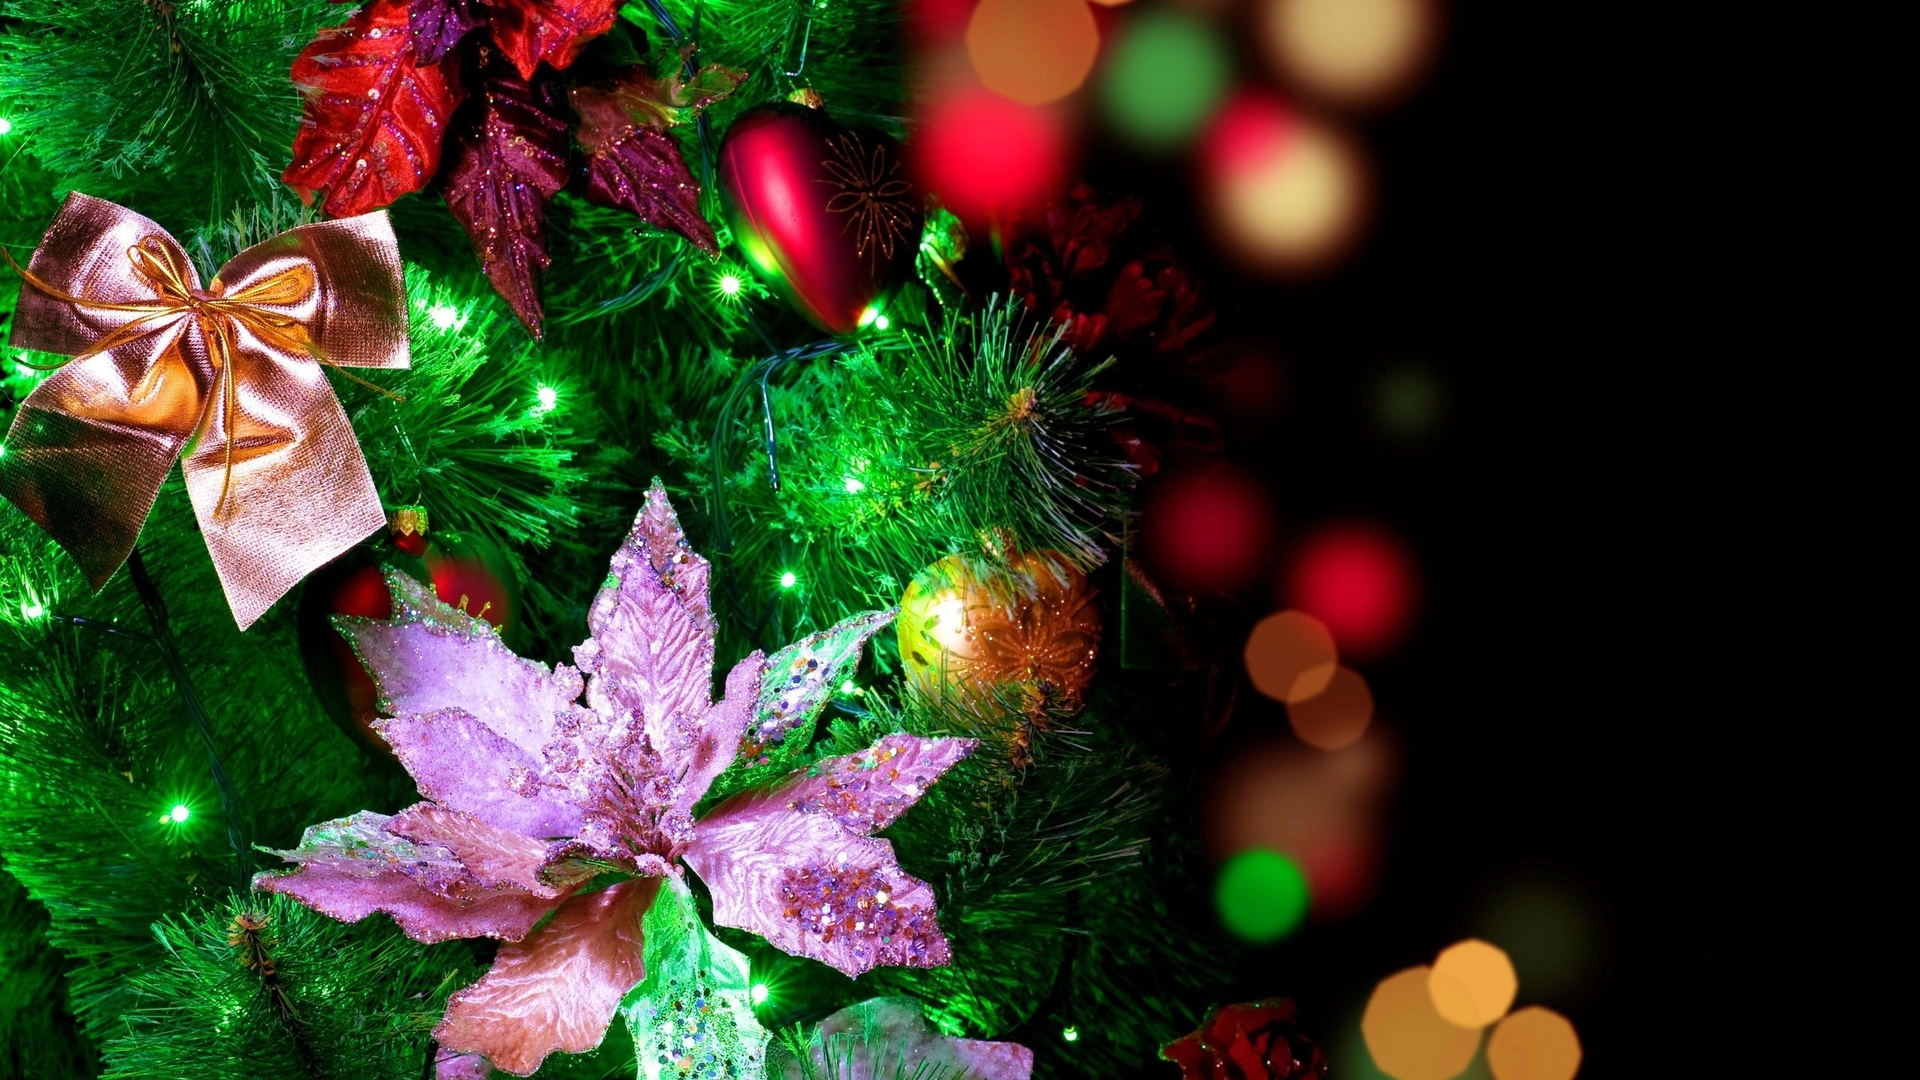 celebration, новый год, елочные, new year, holidays, winter, шары